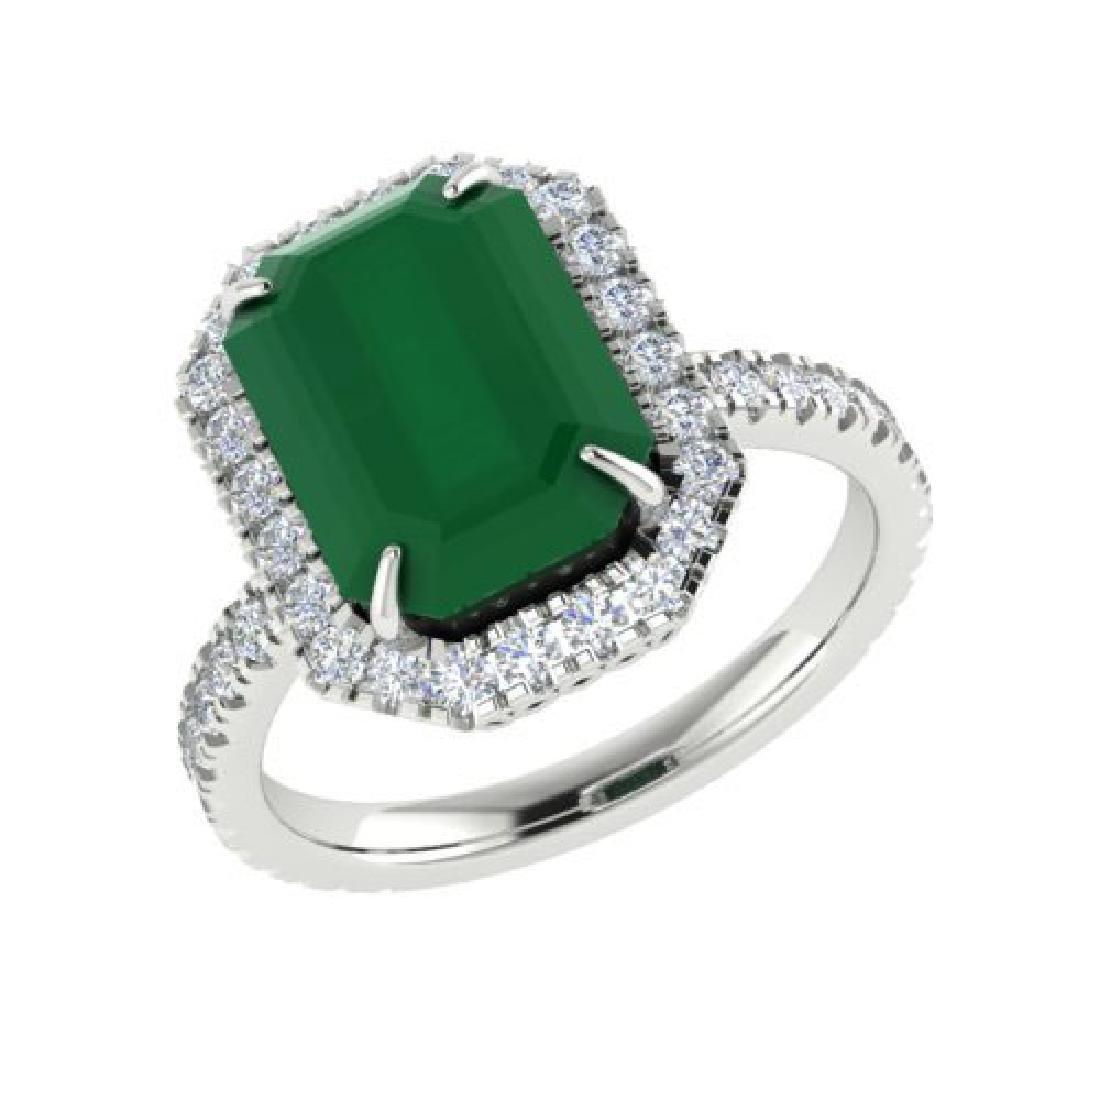 5.33 CTW Emerald And Micro Pave VS/SI Diamond Halo Ring - 2